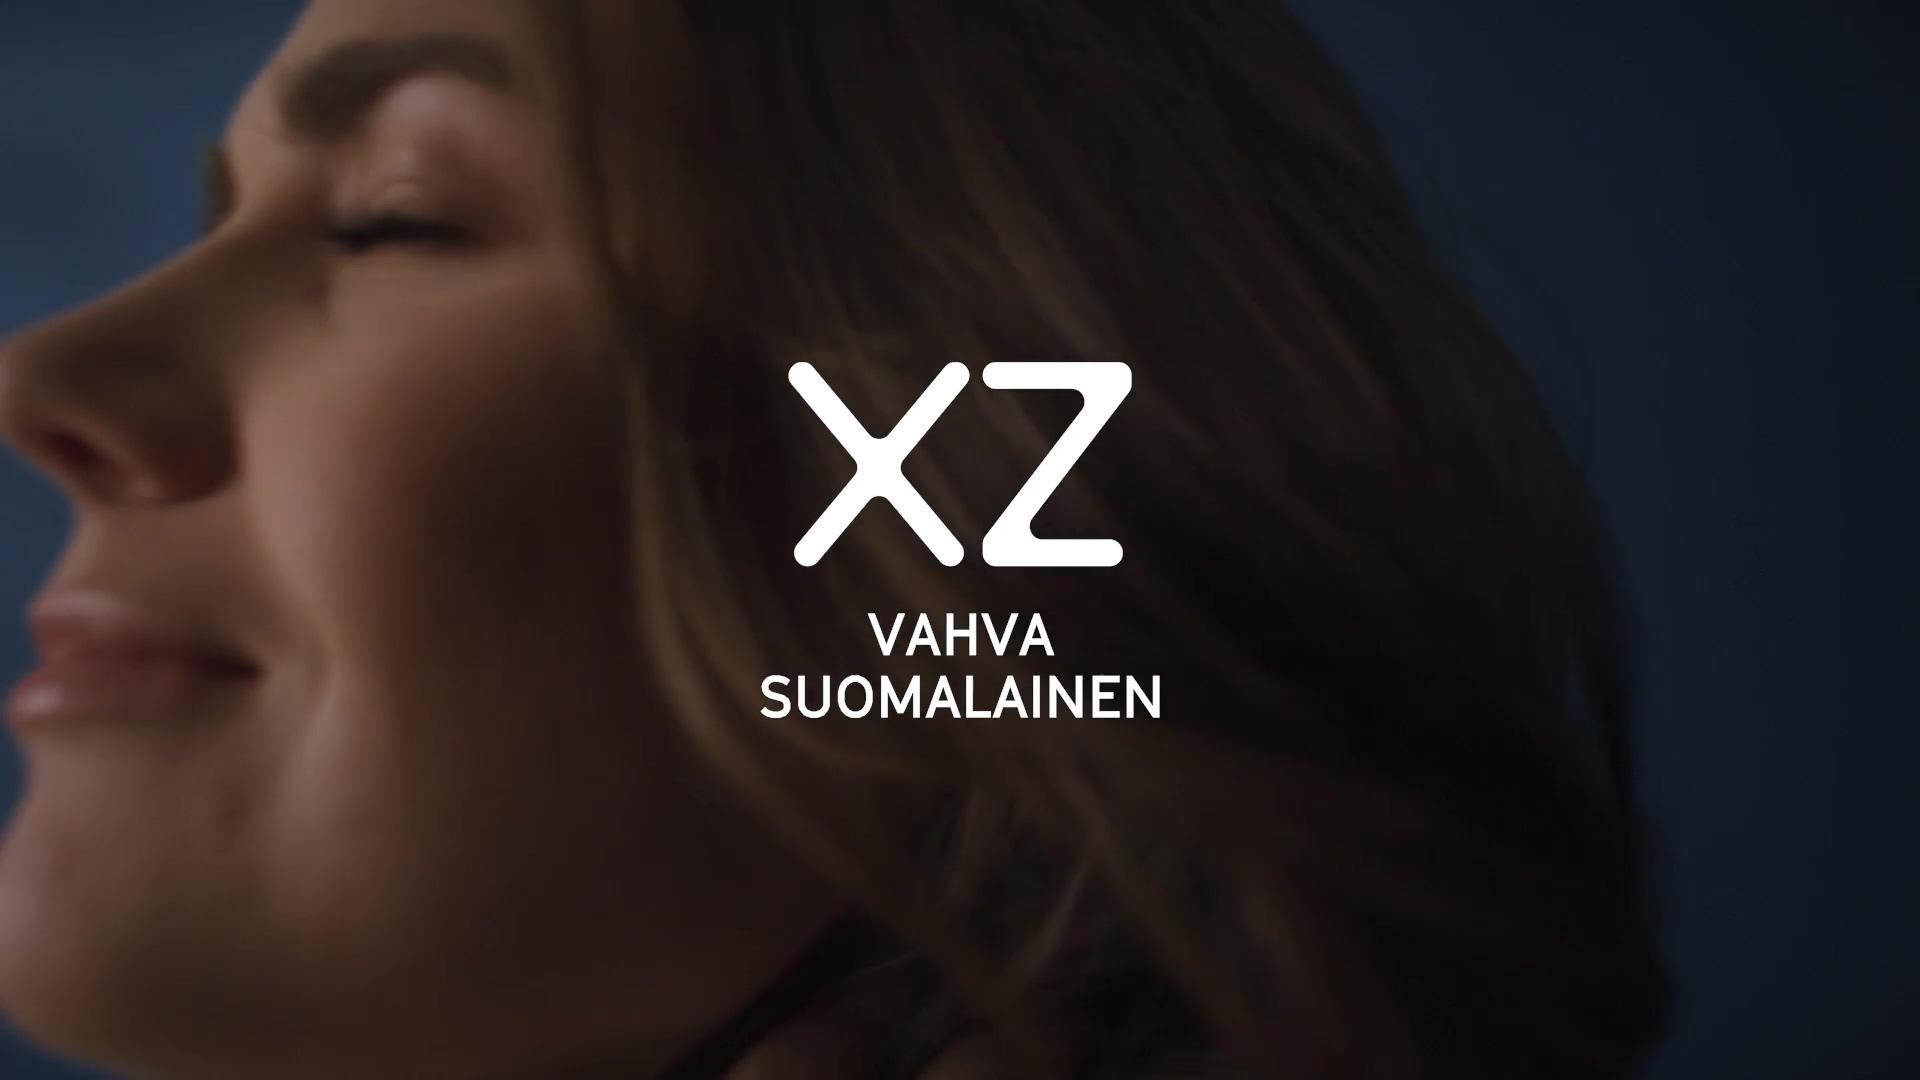 XZ - Mustikka